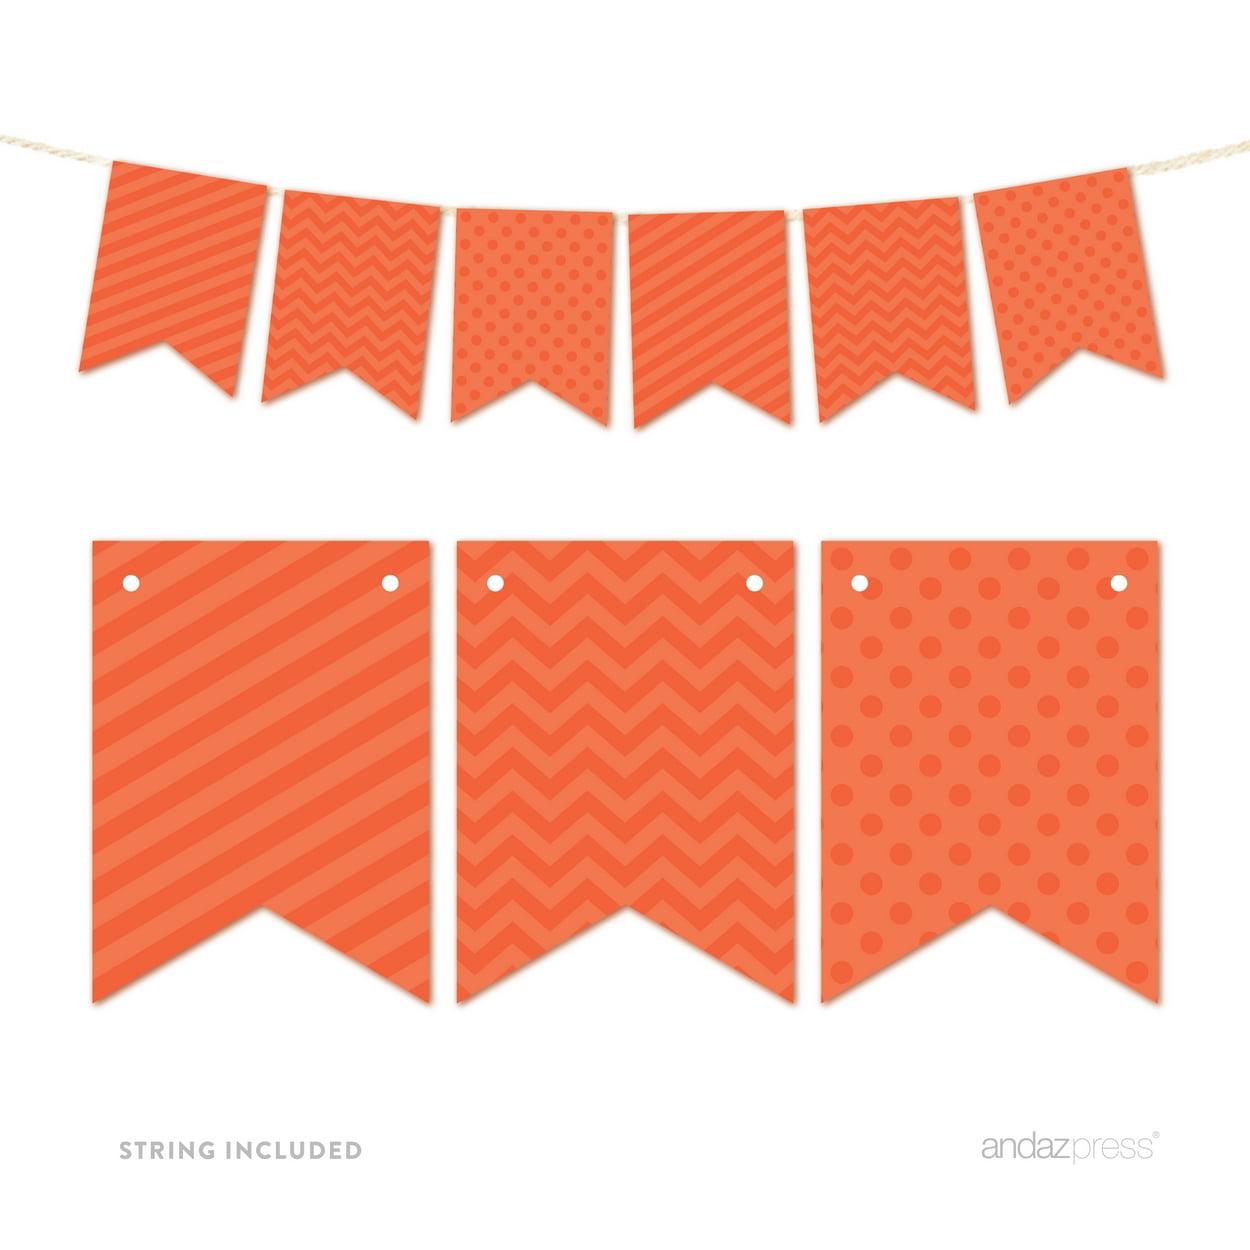 Tangerine Orange Hanging Pennant Banner Party Garland Decor